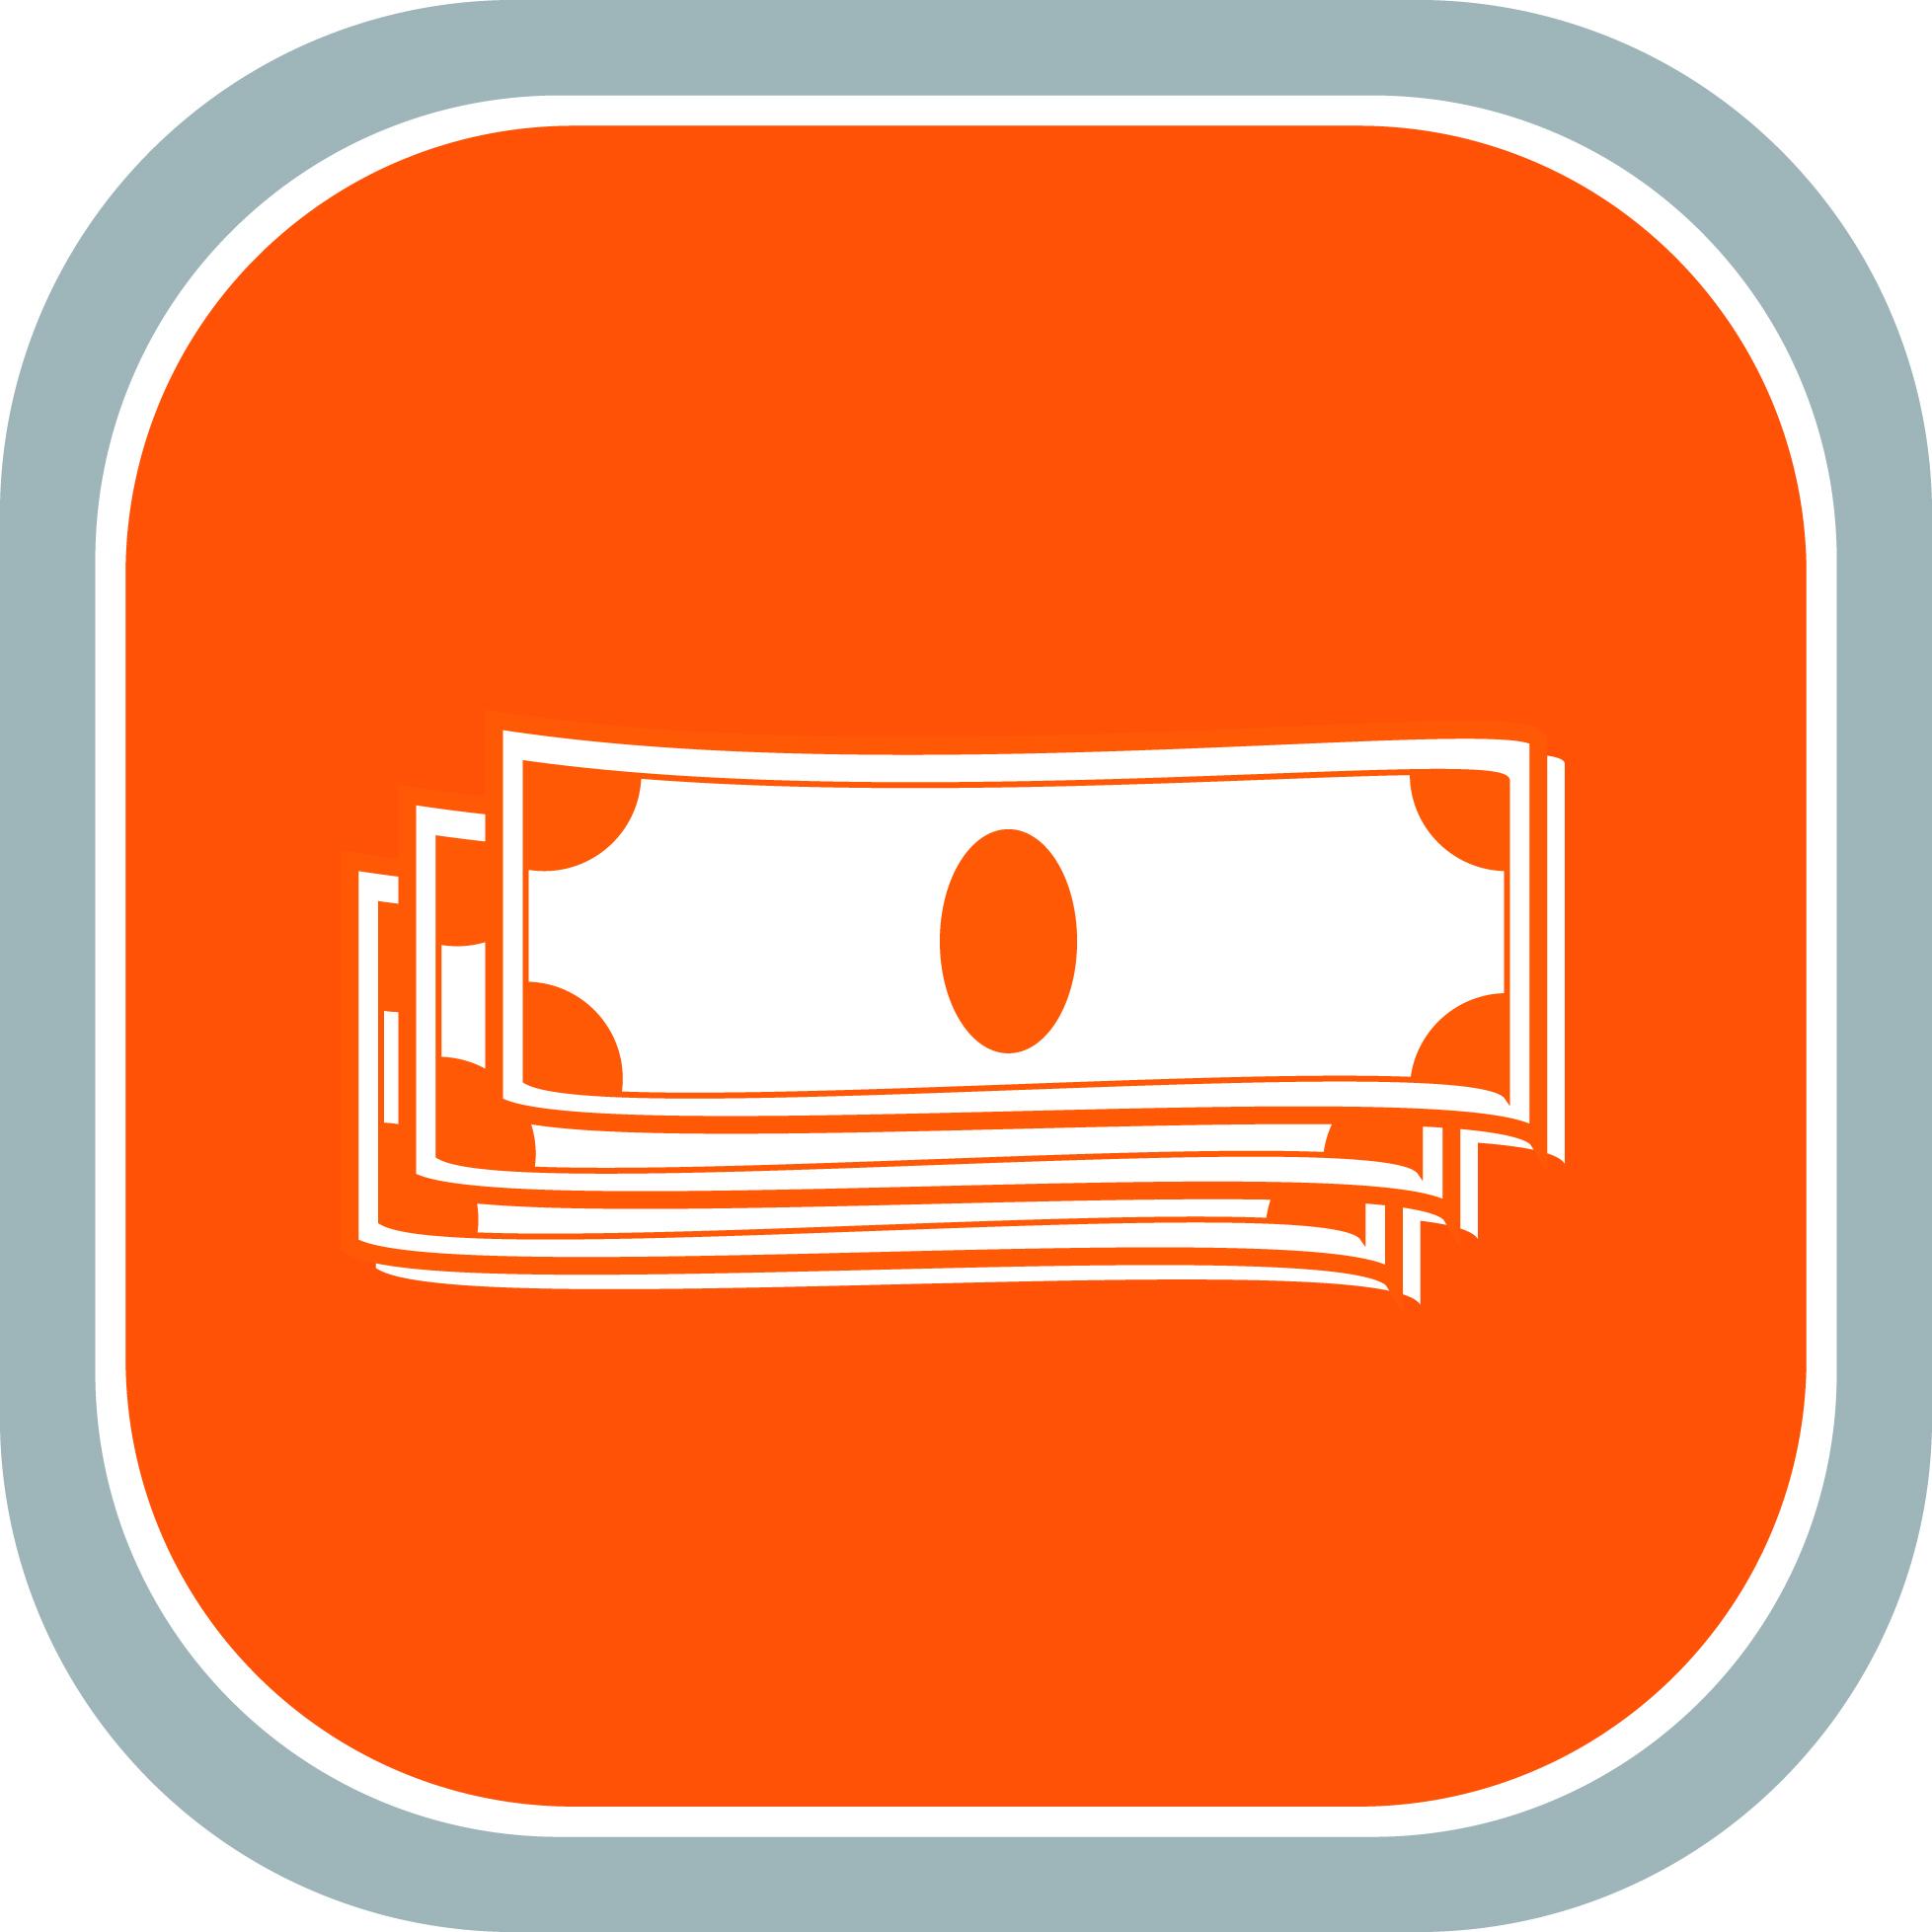 Financovanie logo